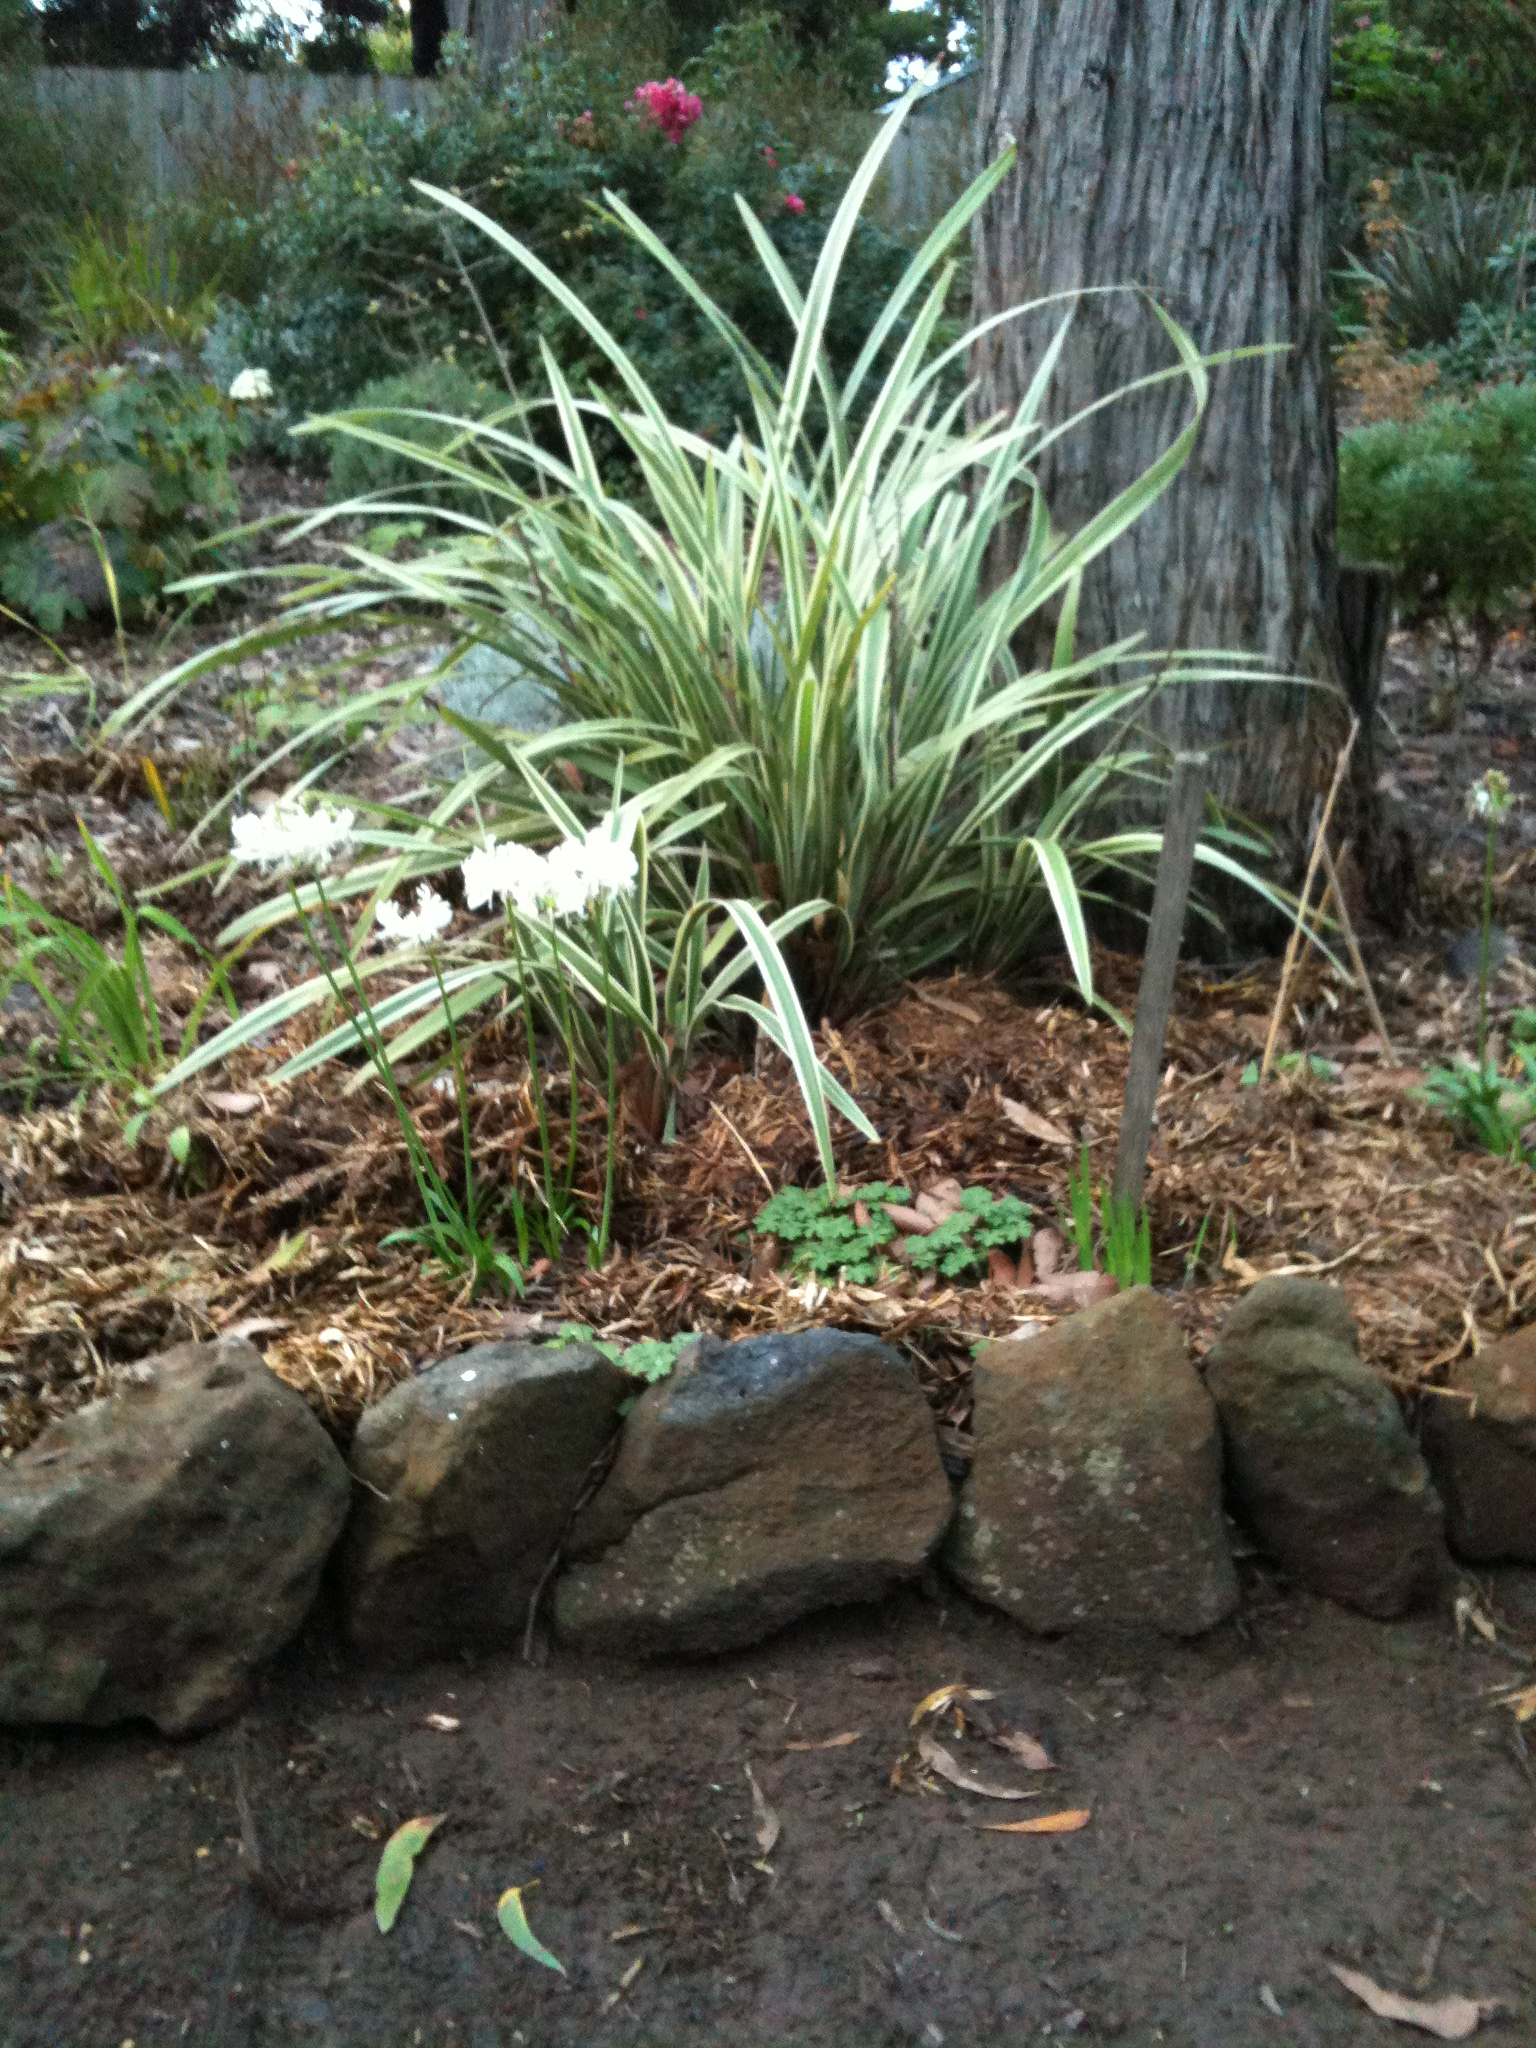 verigated grasses